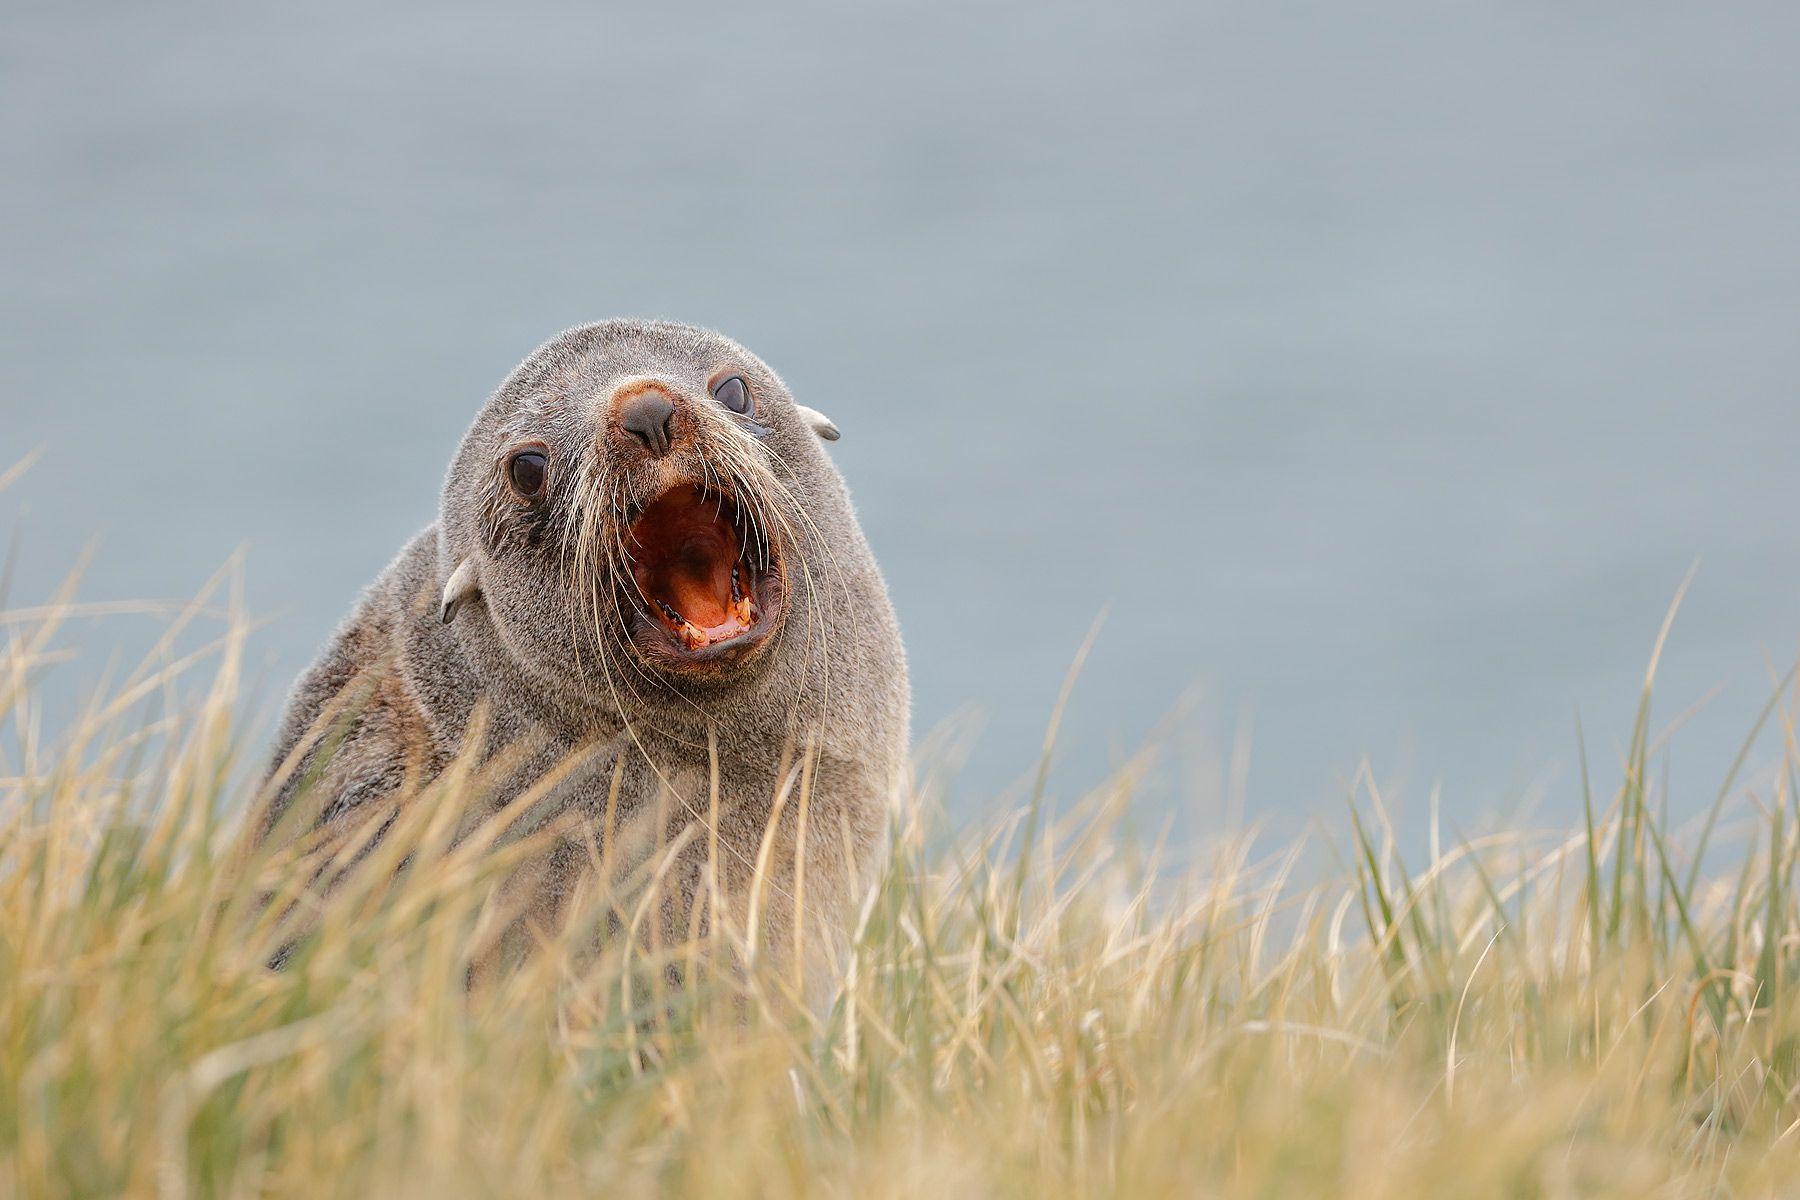 Fur-Seal-in-the-tussack-grass_B8R3063-Elsehul,-South-Georgia-Islands,-Southern-ocean.jpg